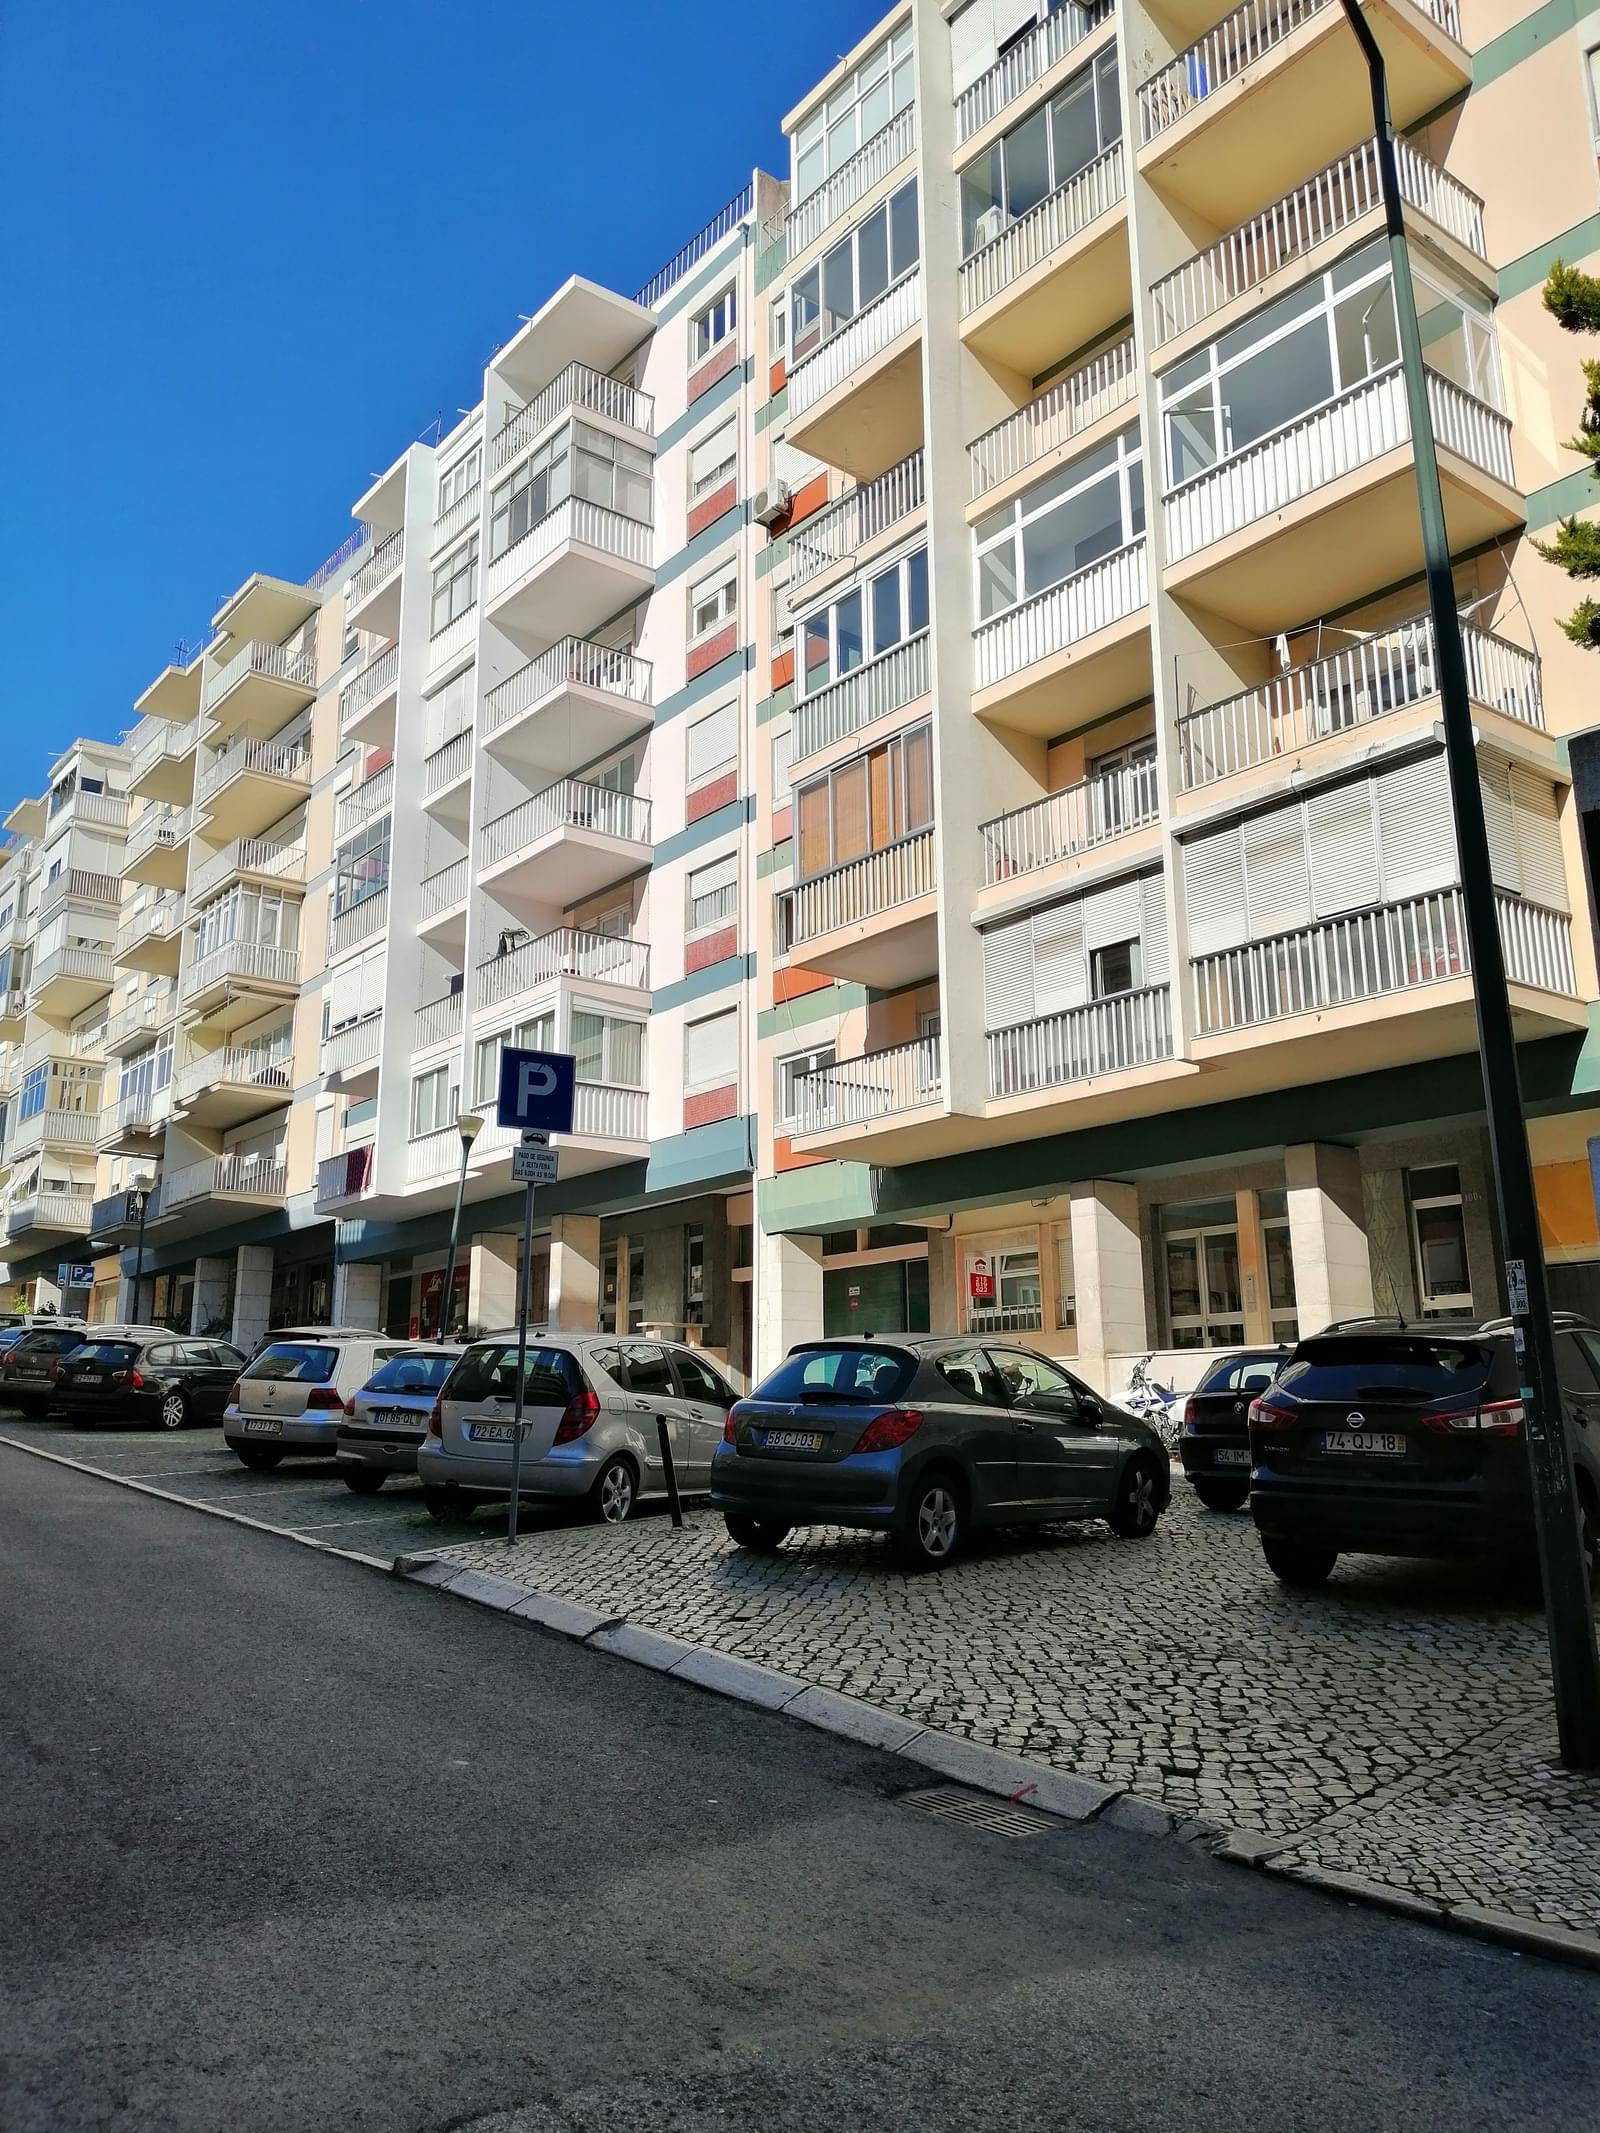 pf18996-apartamento-t3-lisboa-760c64c2-0ccd-4095-97e7-9815426a81b1